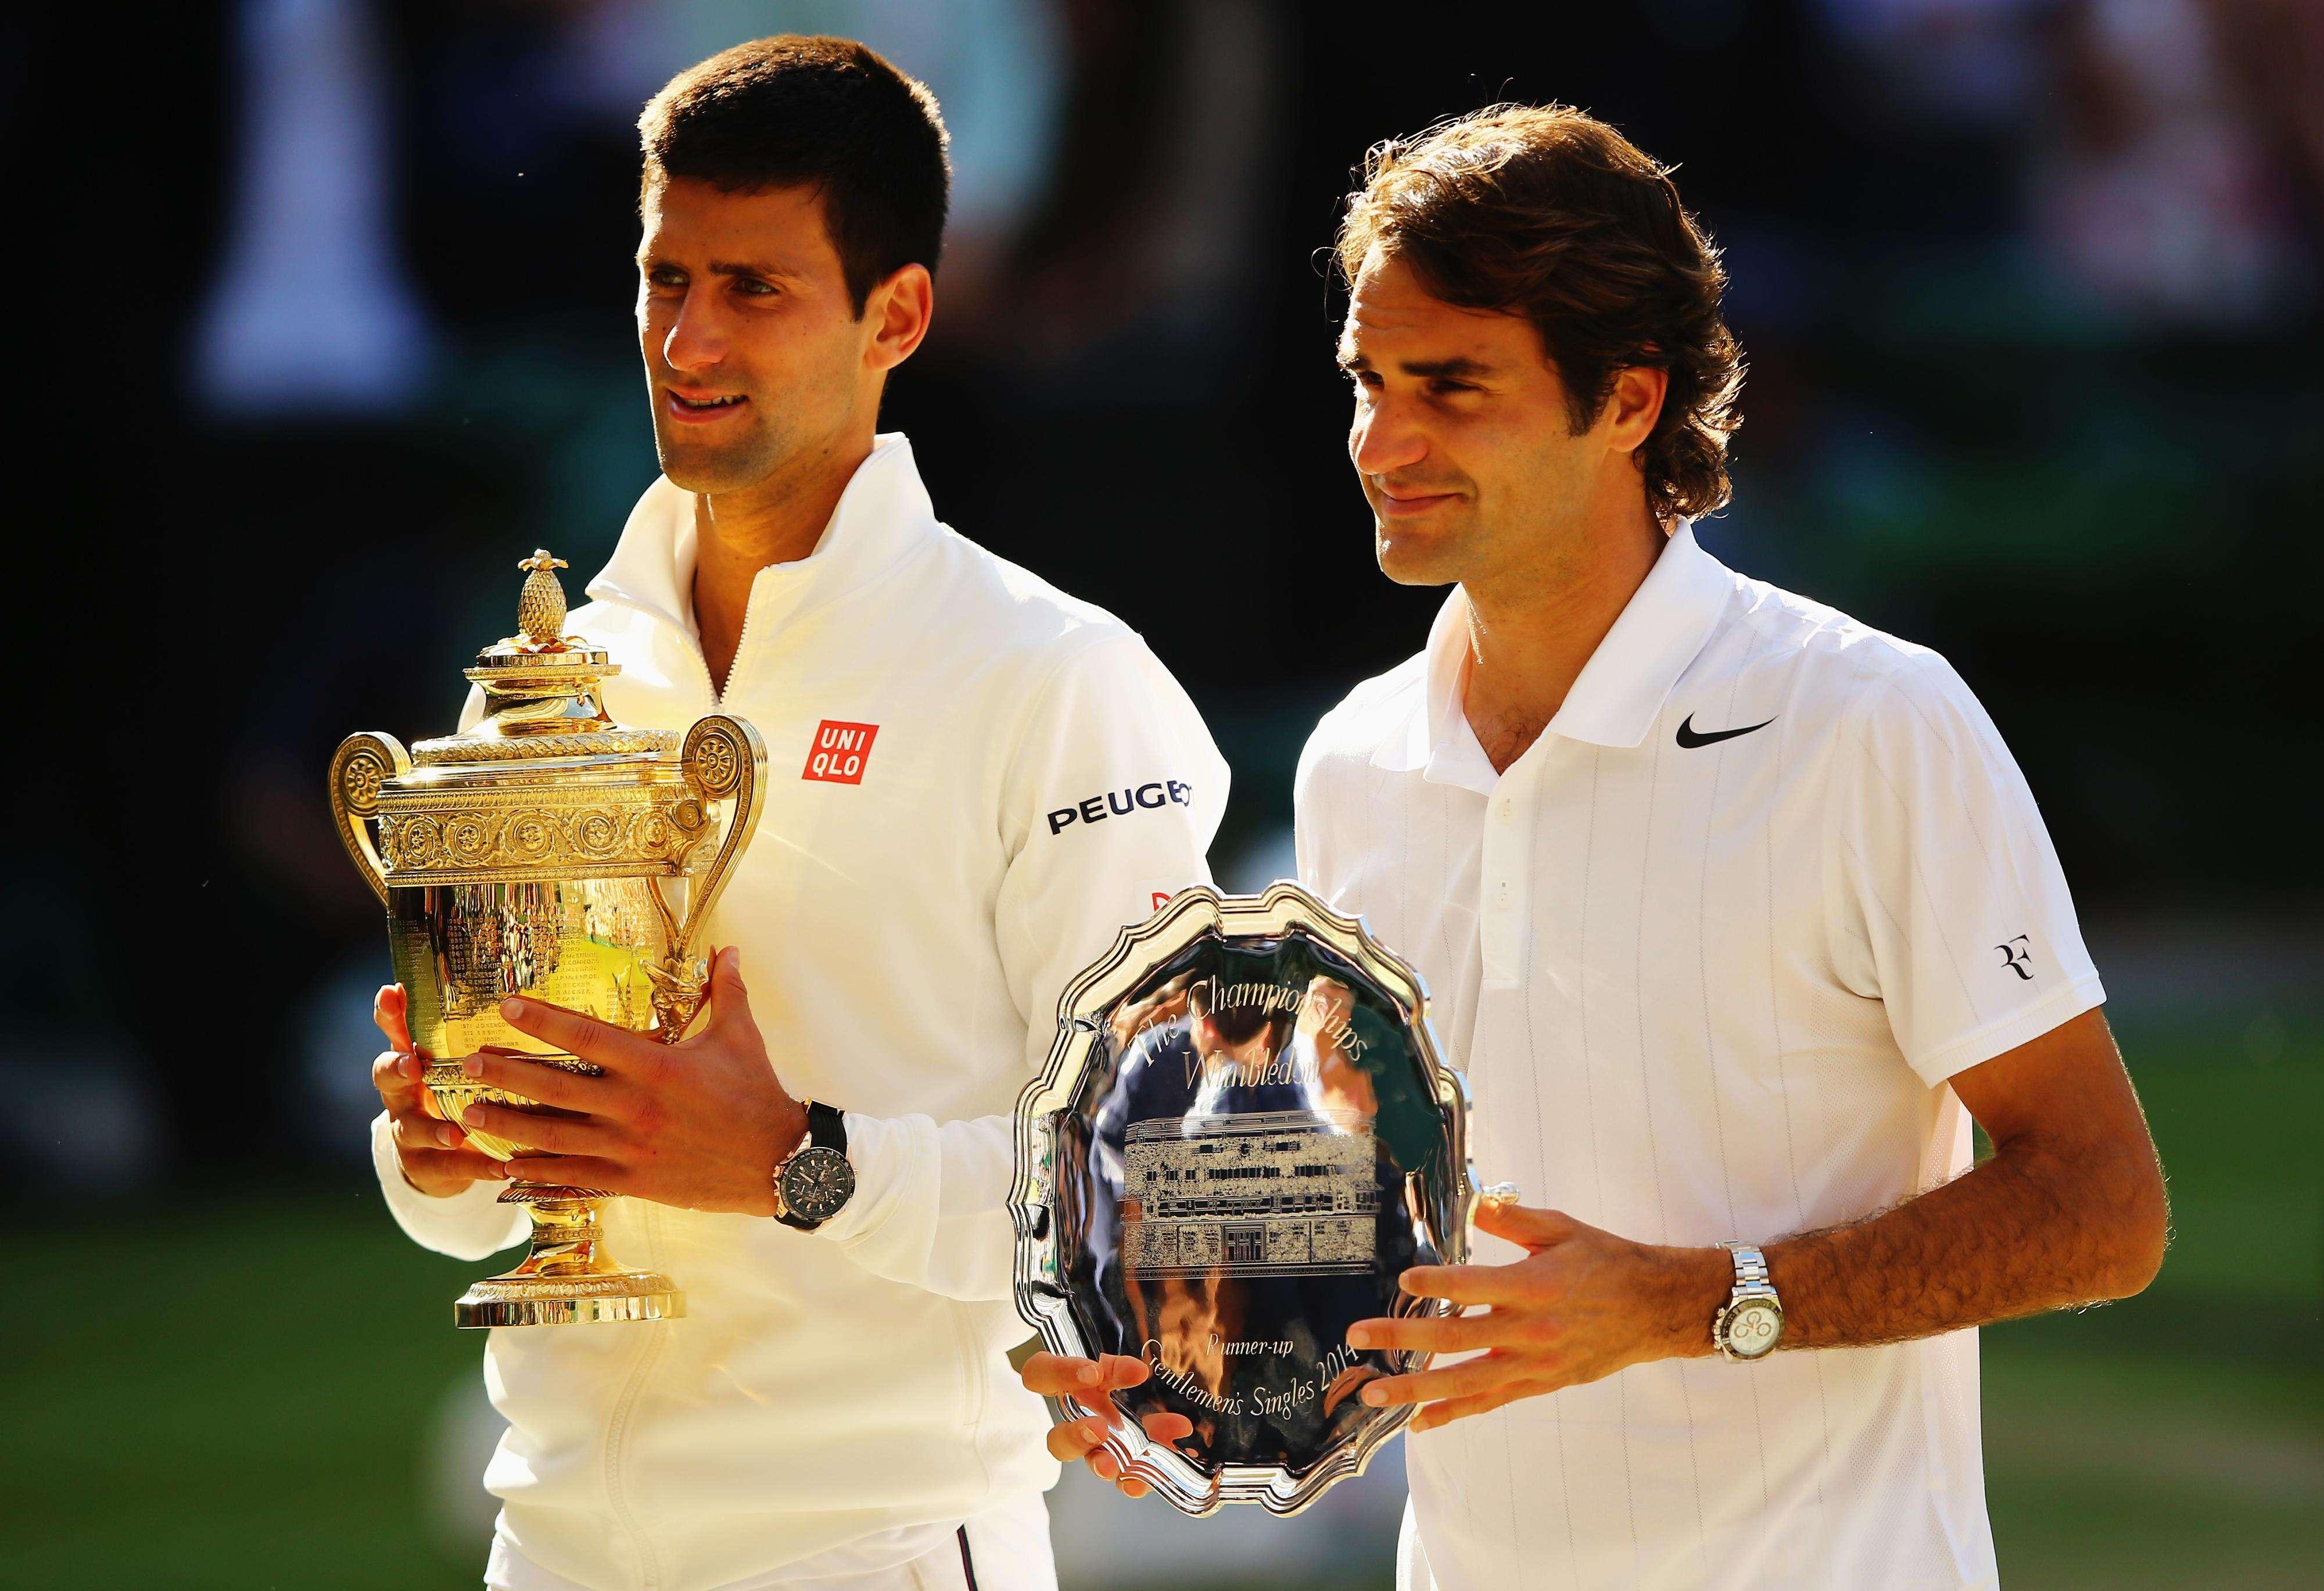 Novak Djokovic y Roger Federer después de disputar la Final de Wimbledon en este 2014 Foto: Gettyimages